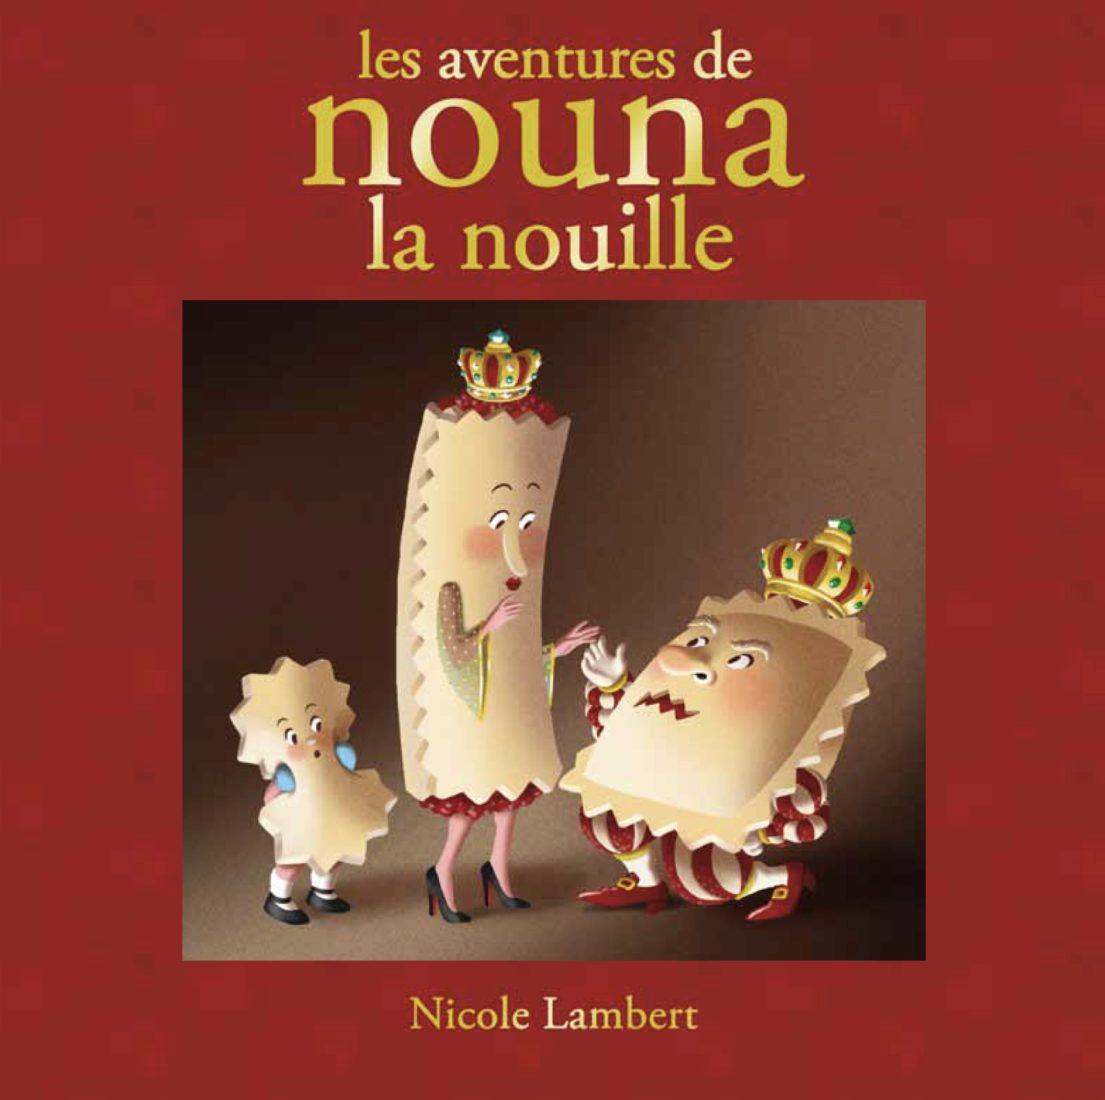 Nicole Lambert Livre Nouna la nouille